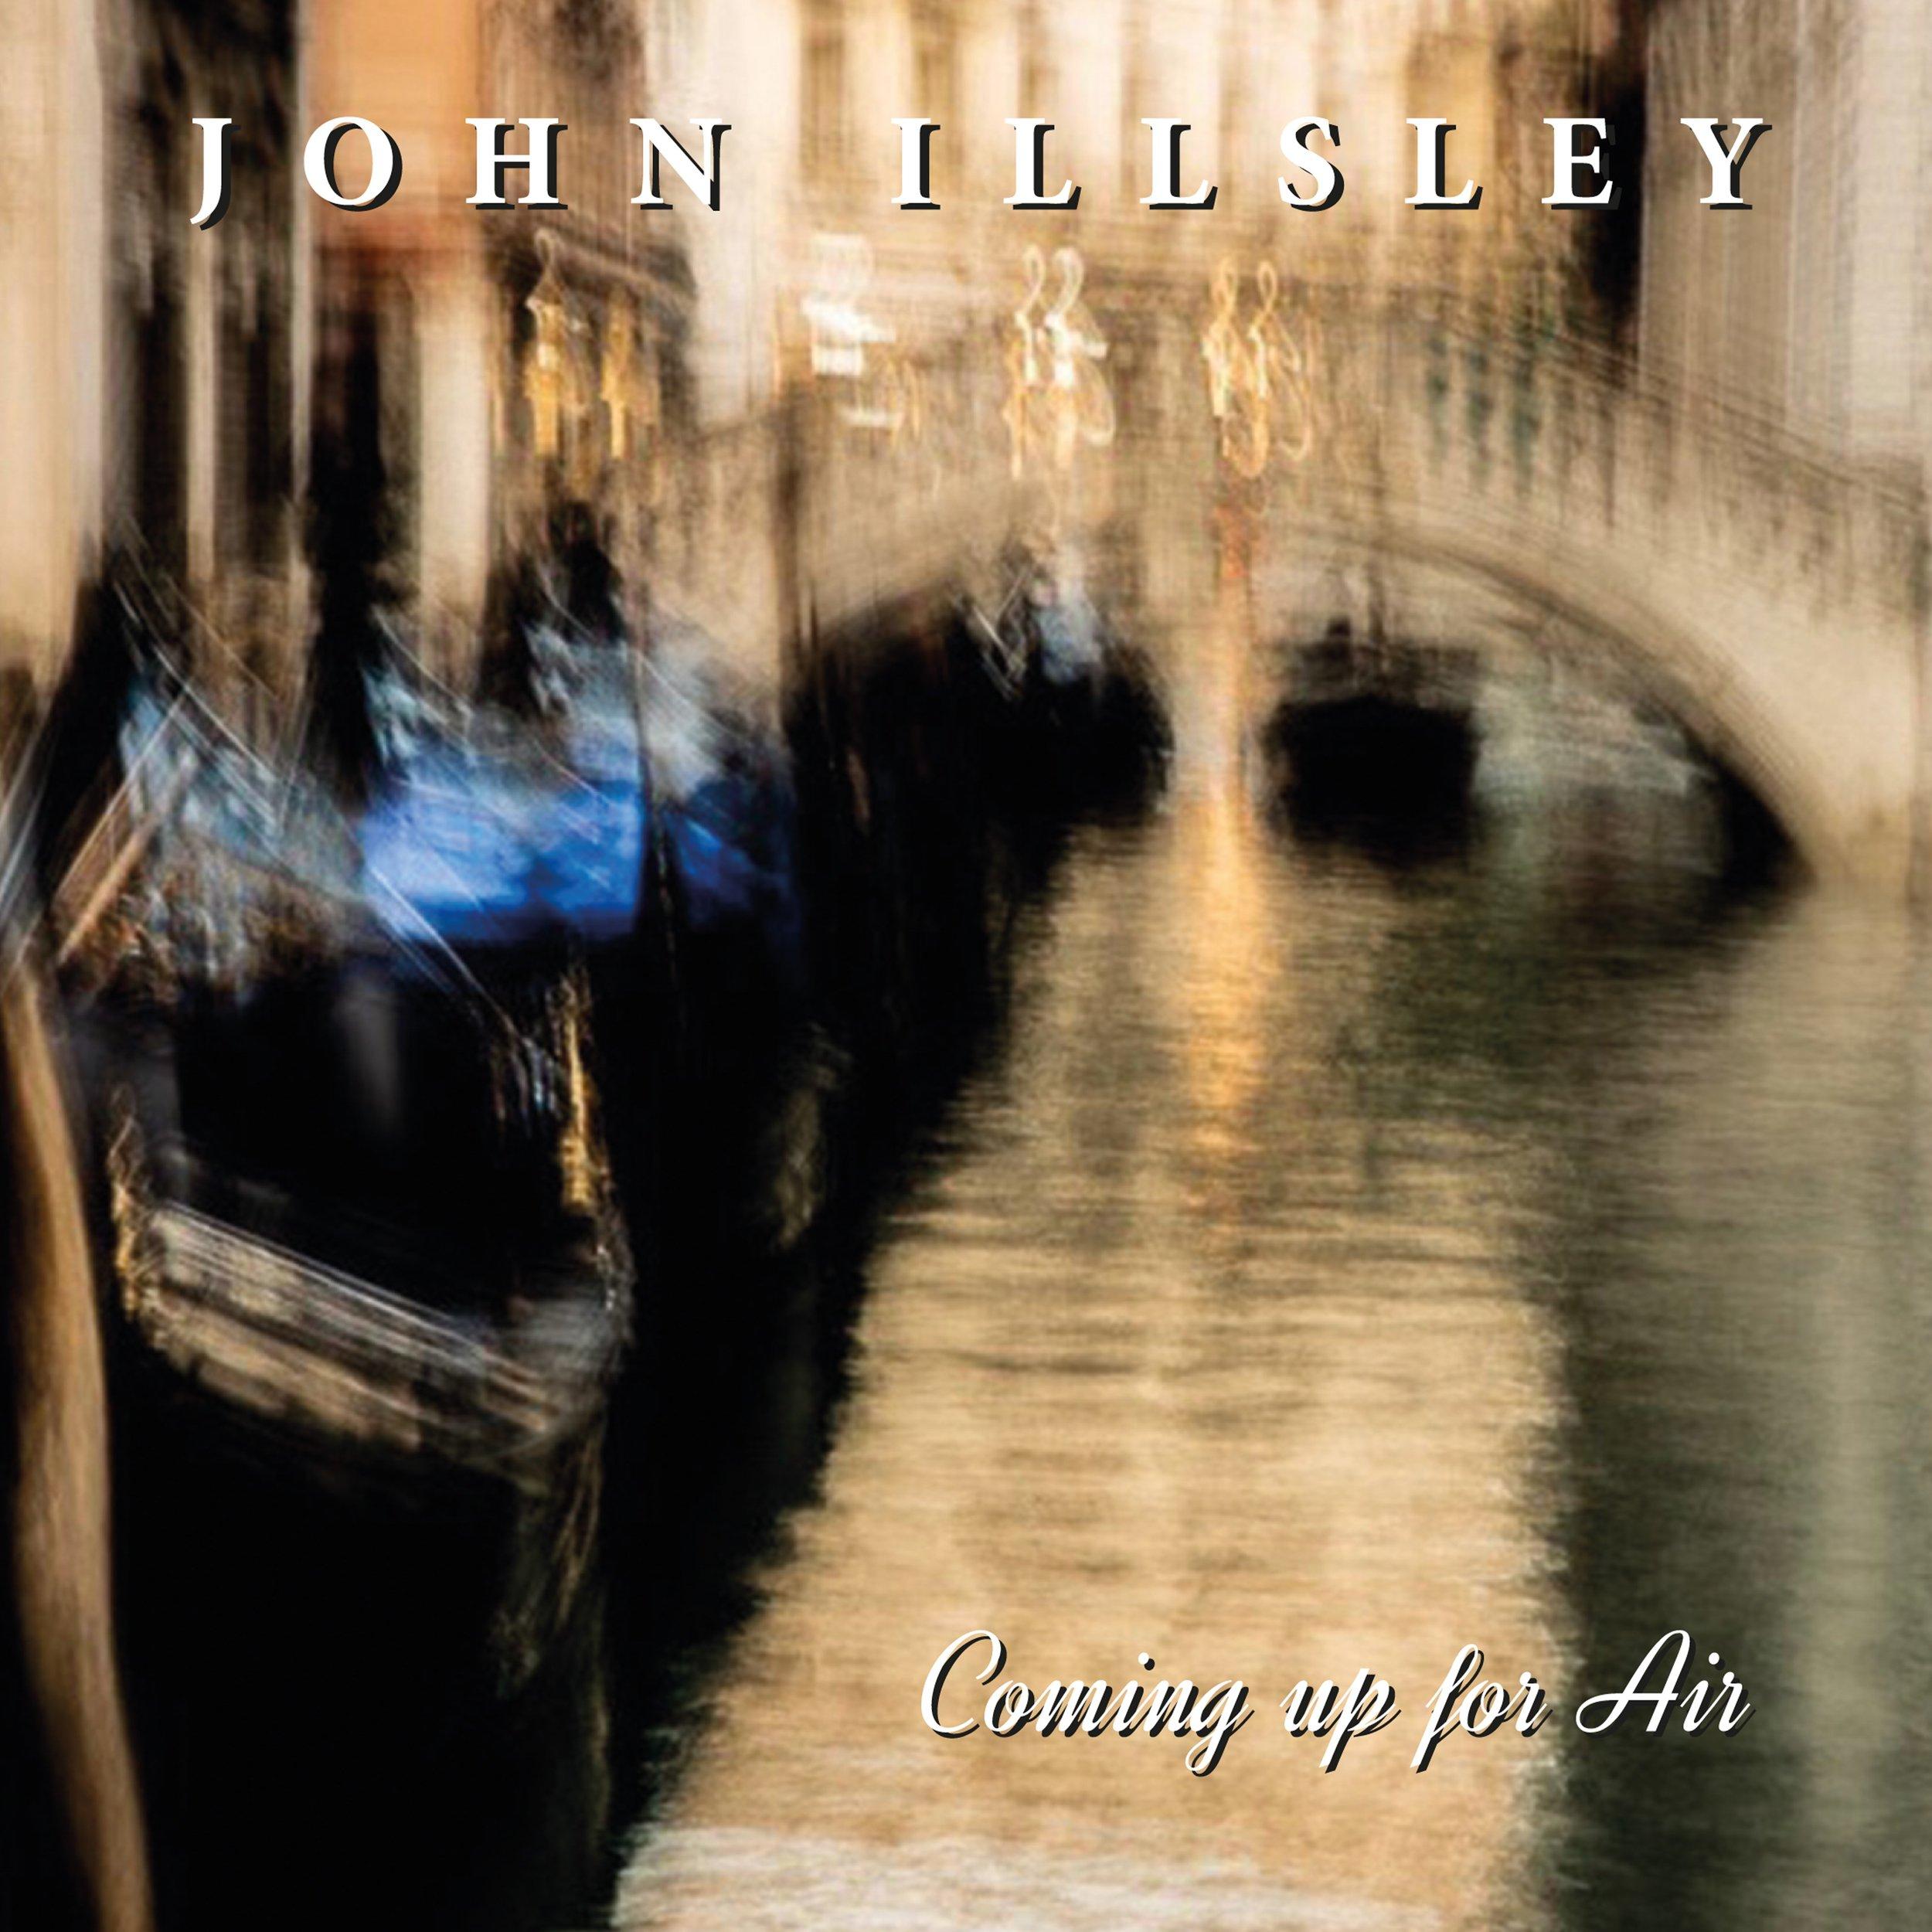 John Illsley Coming Up For Air FINAL 5037300849393.jpg